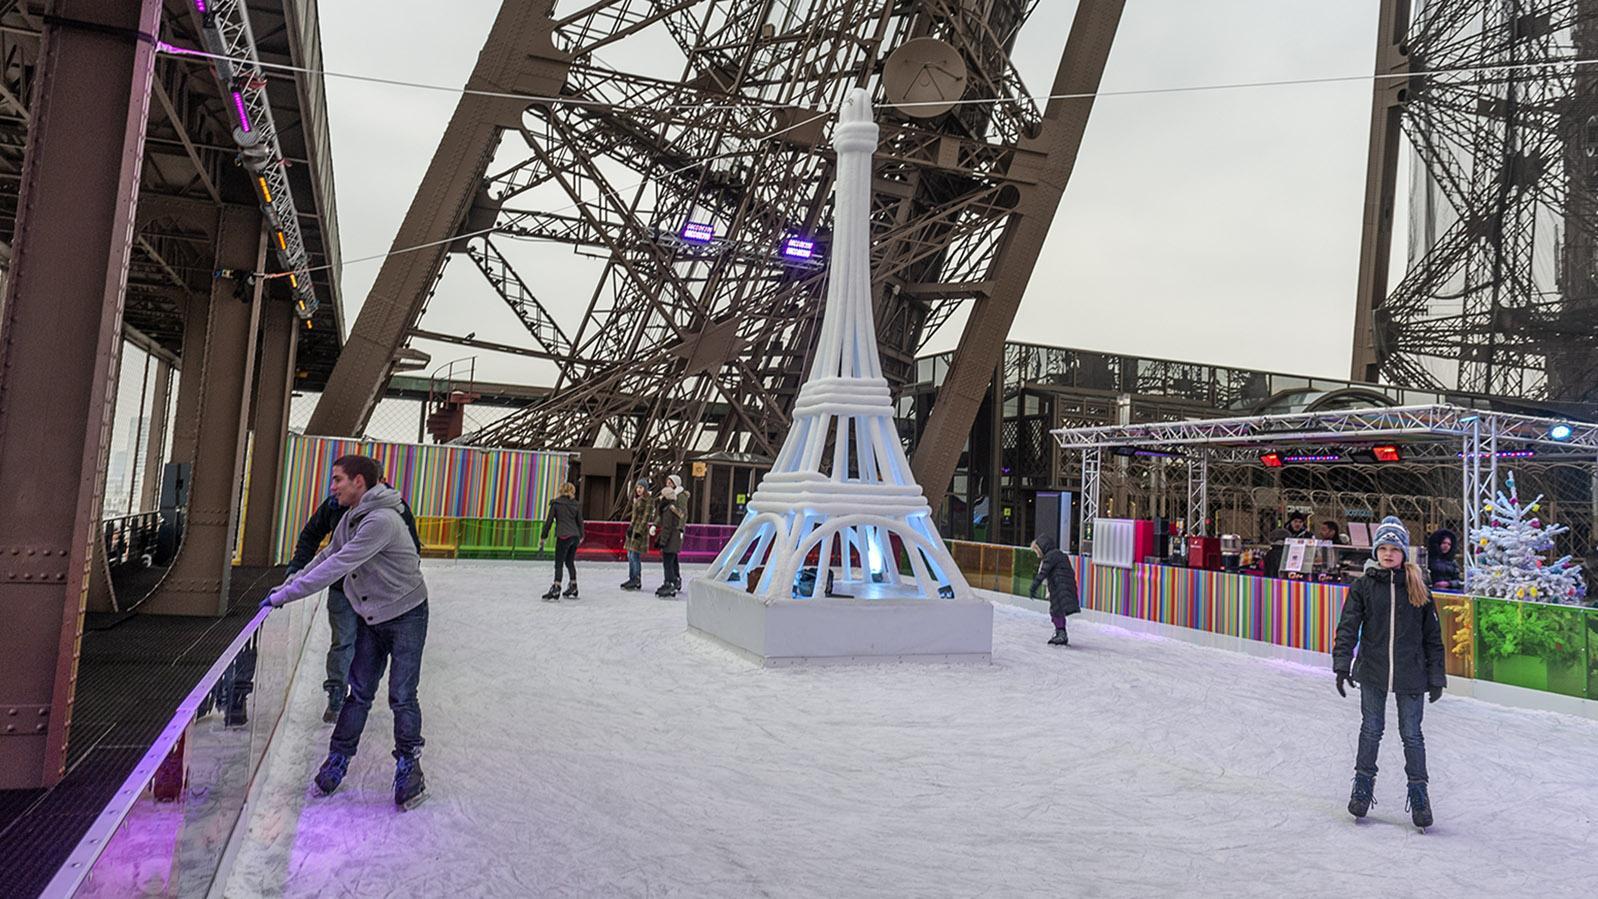 Eislaufen auf dem Eiffelturm. Foto: Hilke Maunder